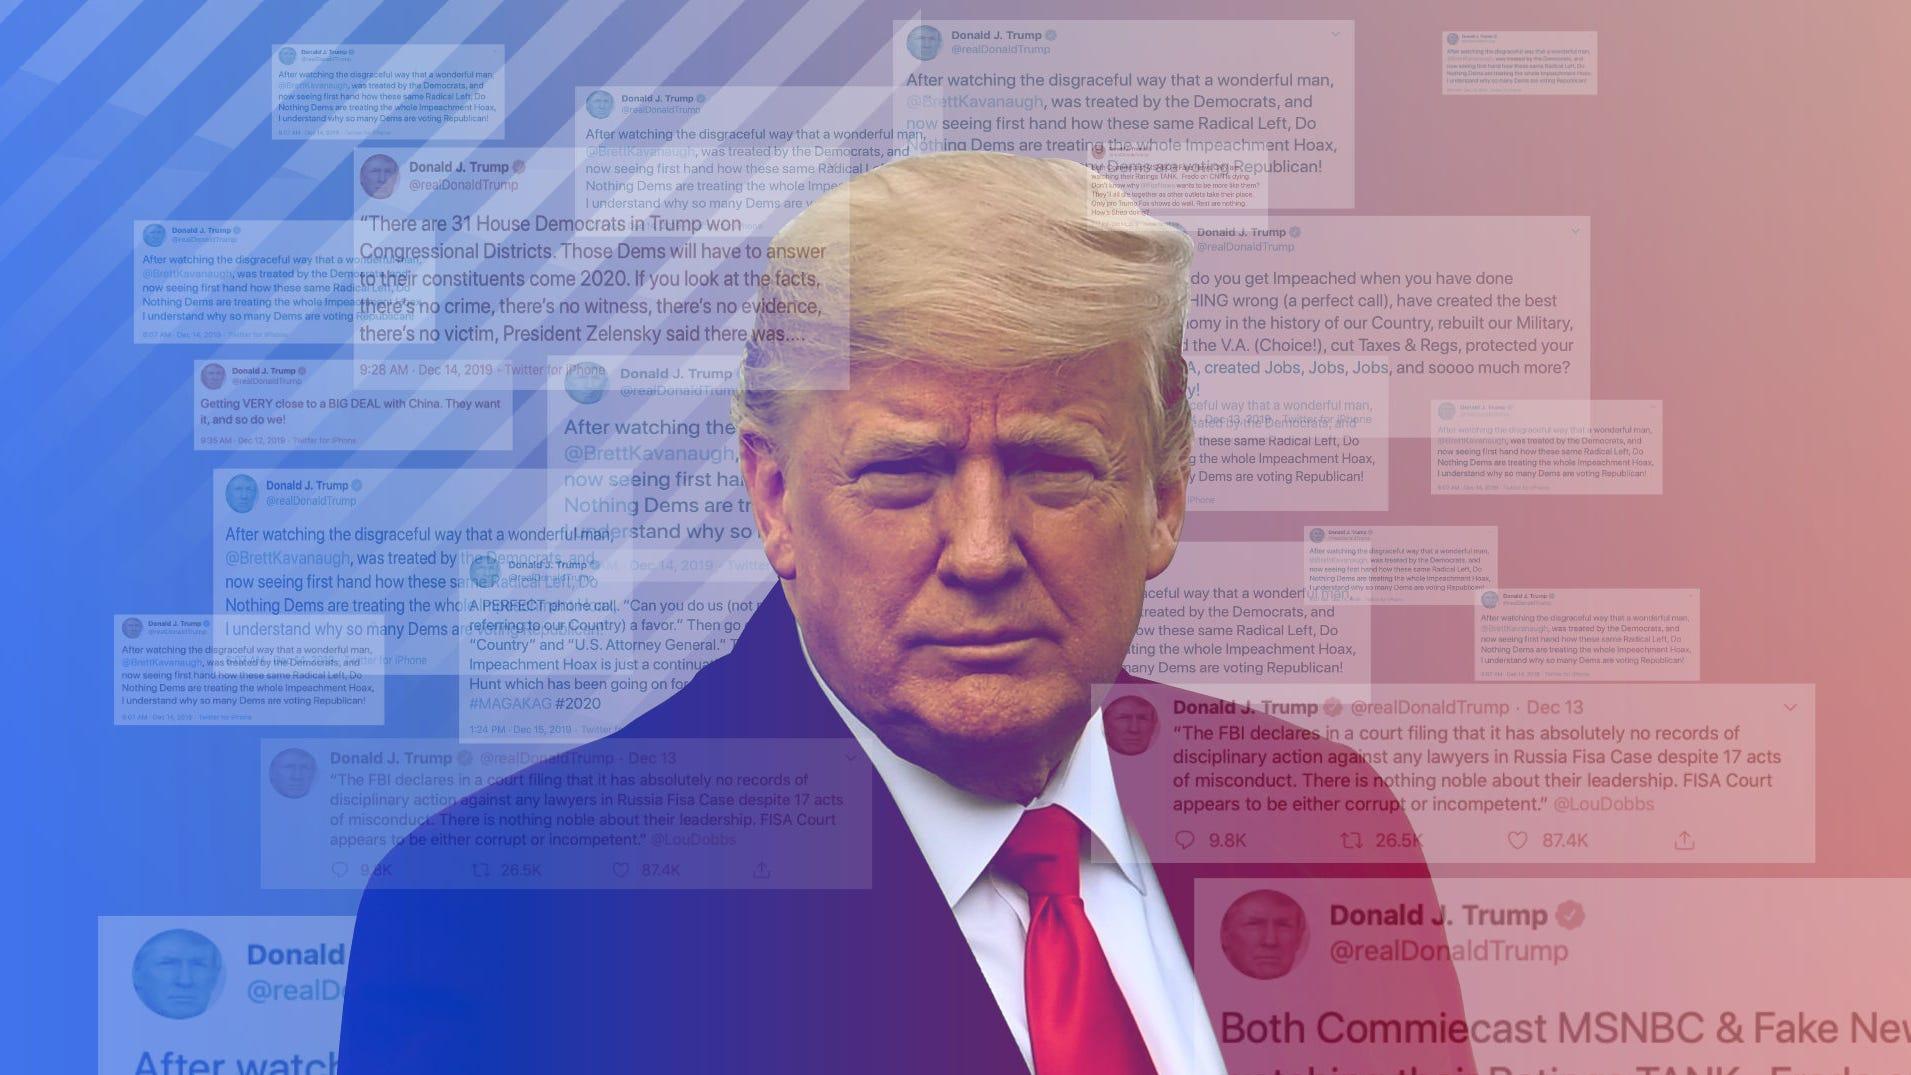 Donald Trump S Tweets Get Negative As Impeachment 2020 Election Loom